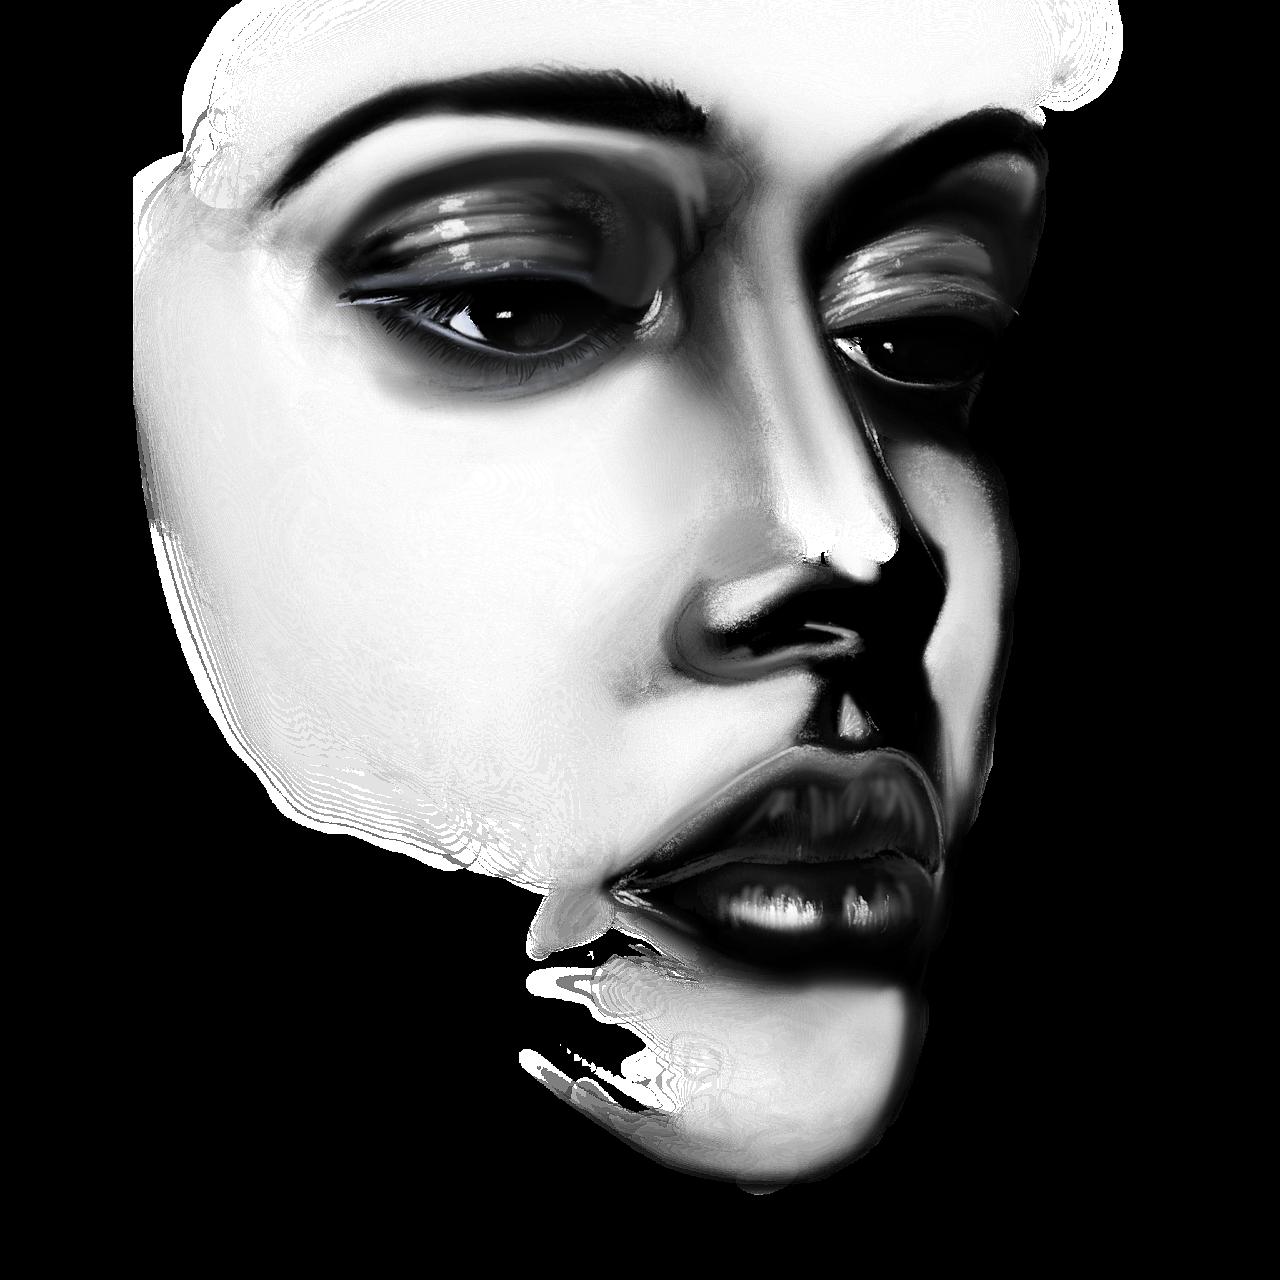 Art Sketch Female Girl Design Free Image From Needpix Com